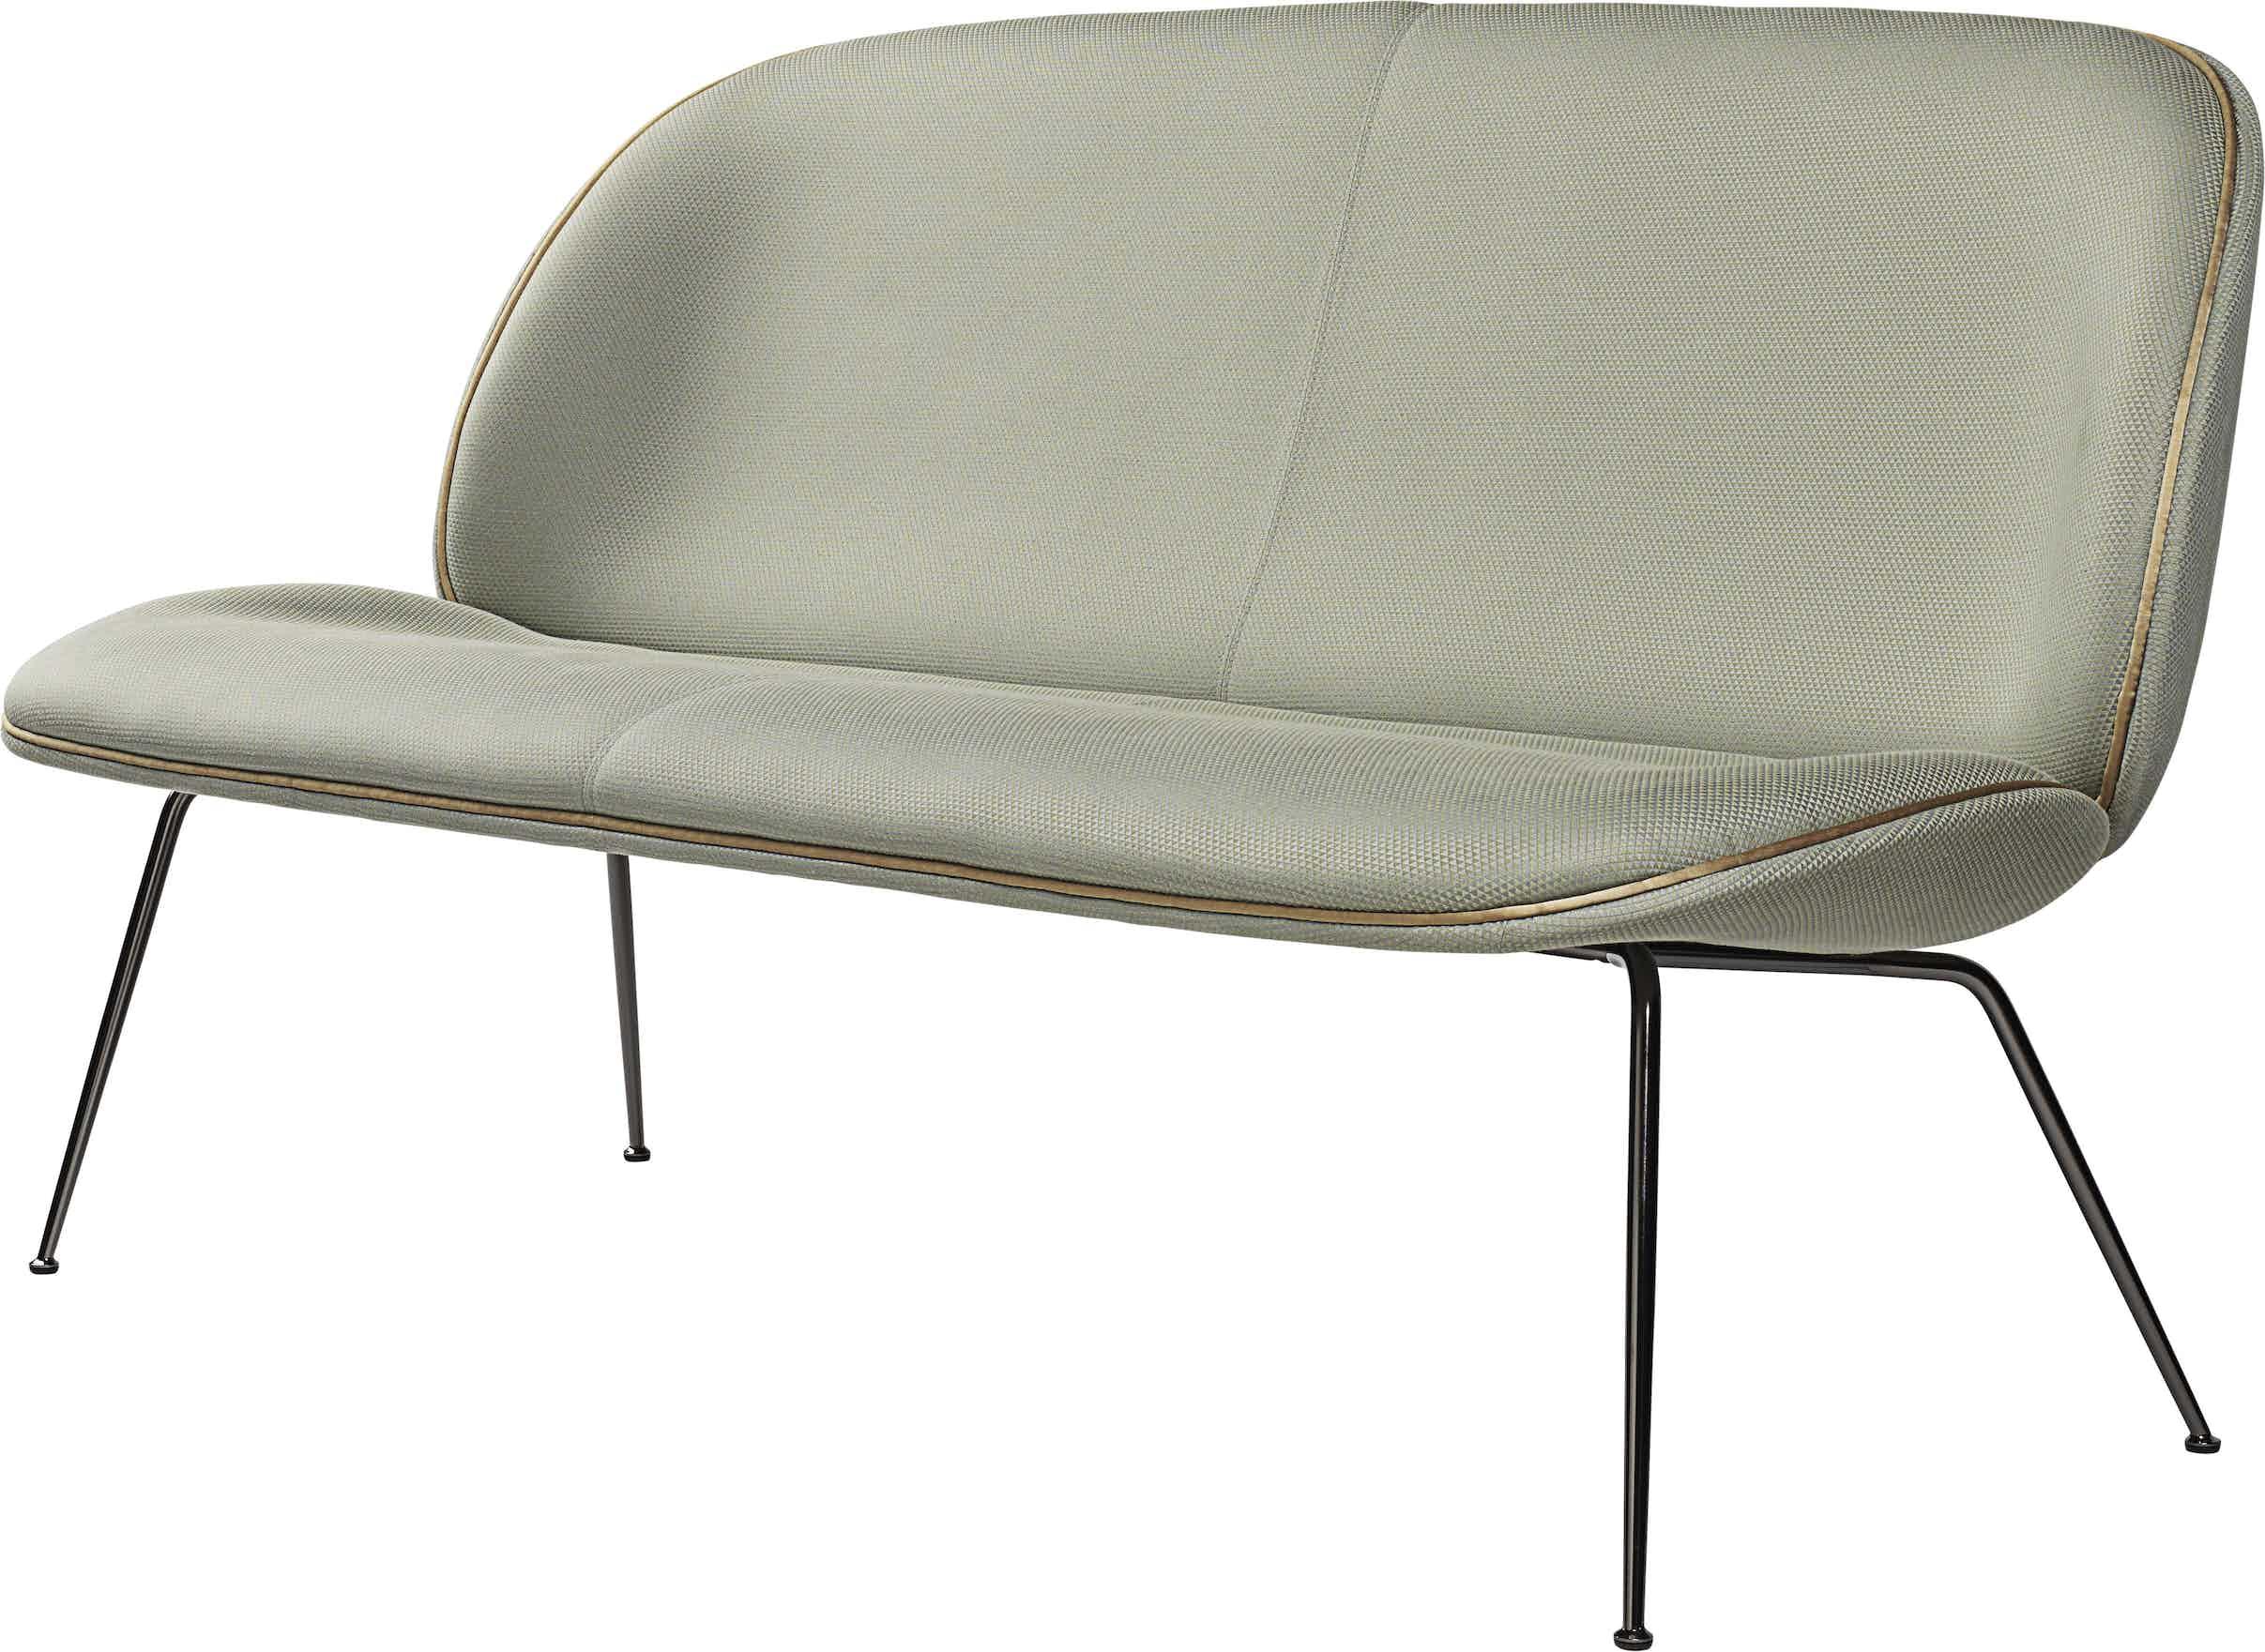 Gubi Beetle Sofa Grey Angle Haute Living